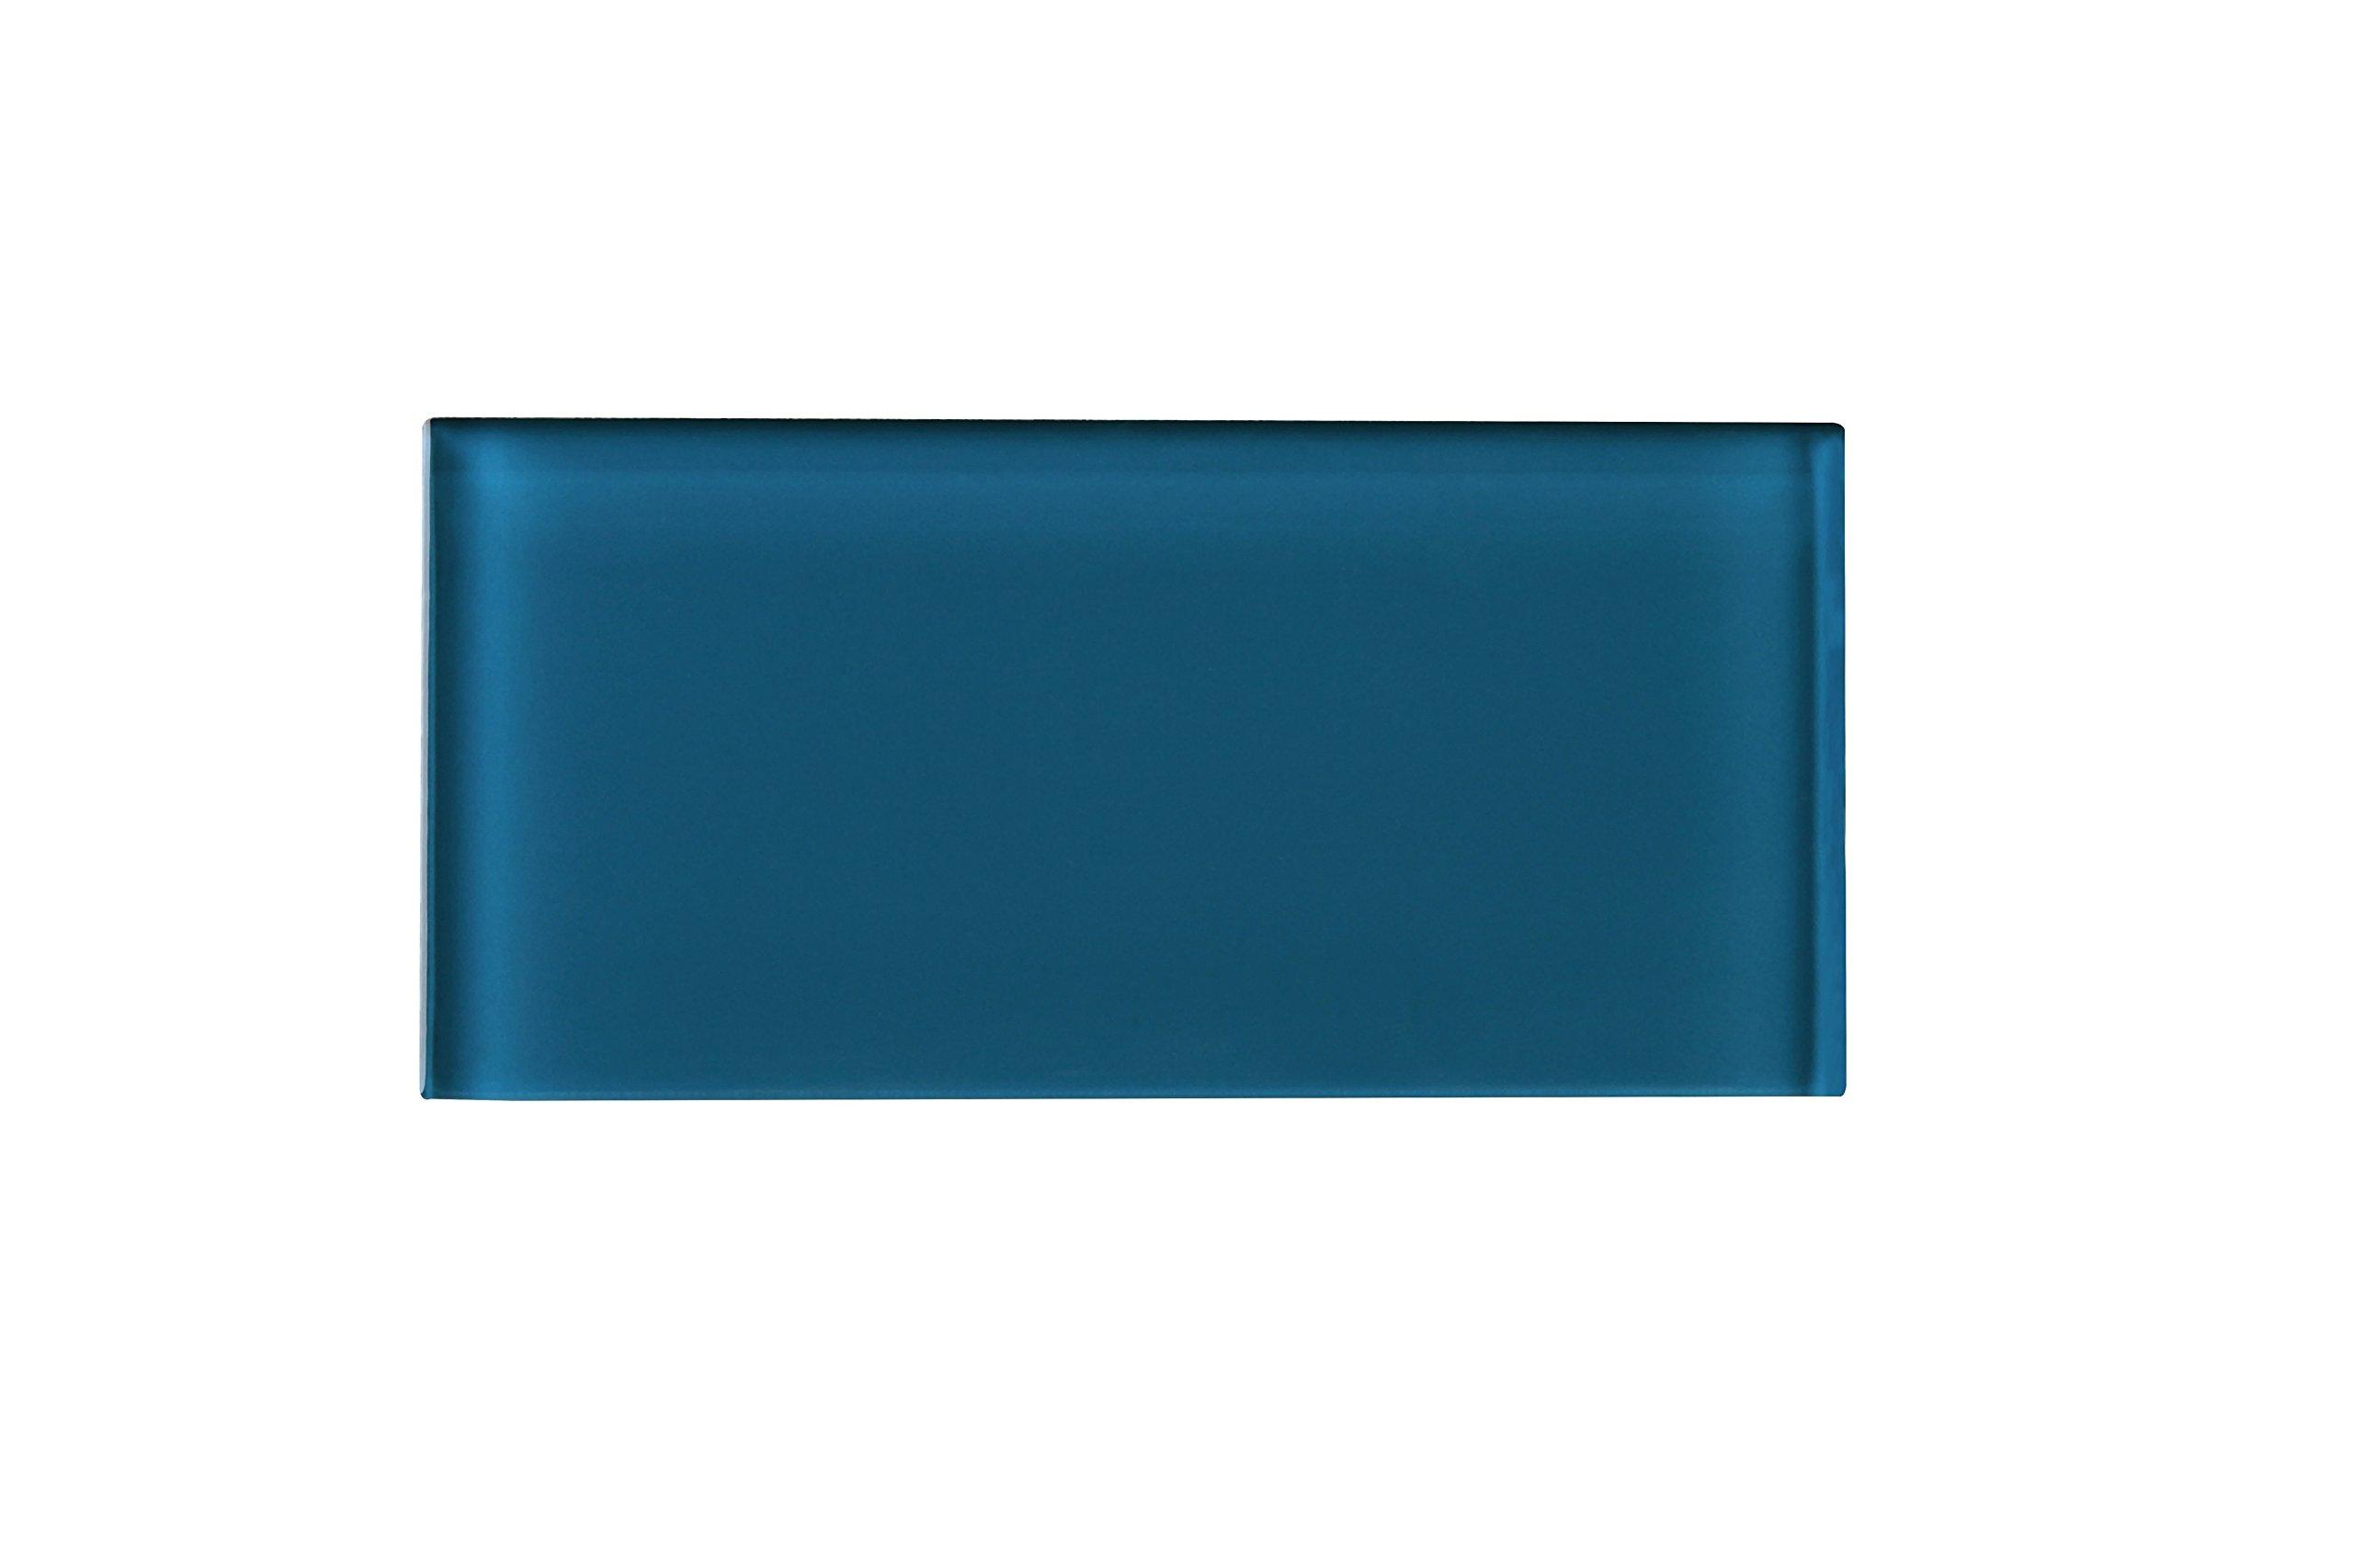 Tile Generation TCSAG-15 Turquoise Blue 3x6 Glass Subway Tile -Kitchen and Bath Backsplash Wall Tile (8pcs)